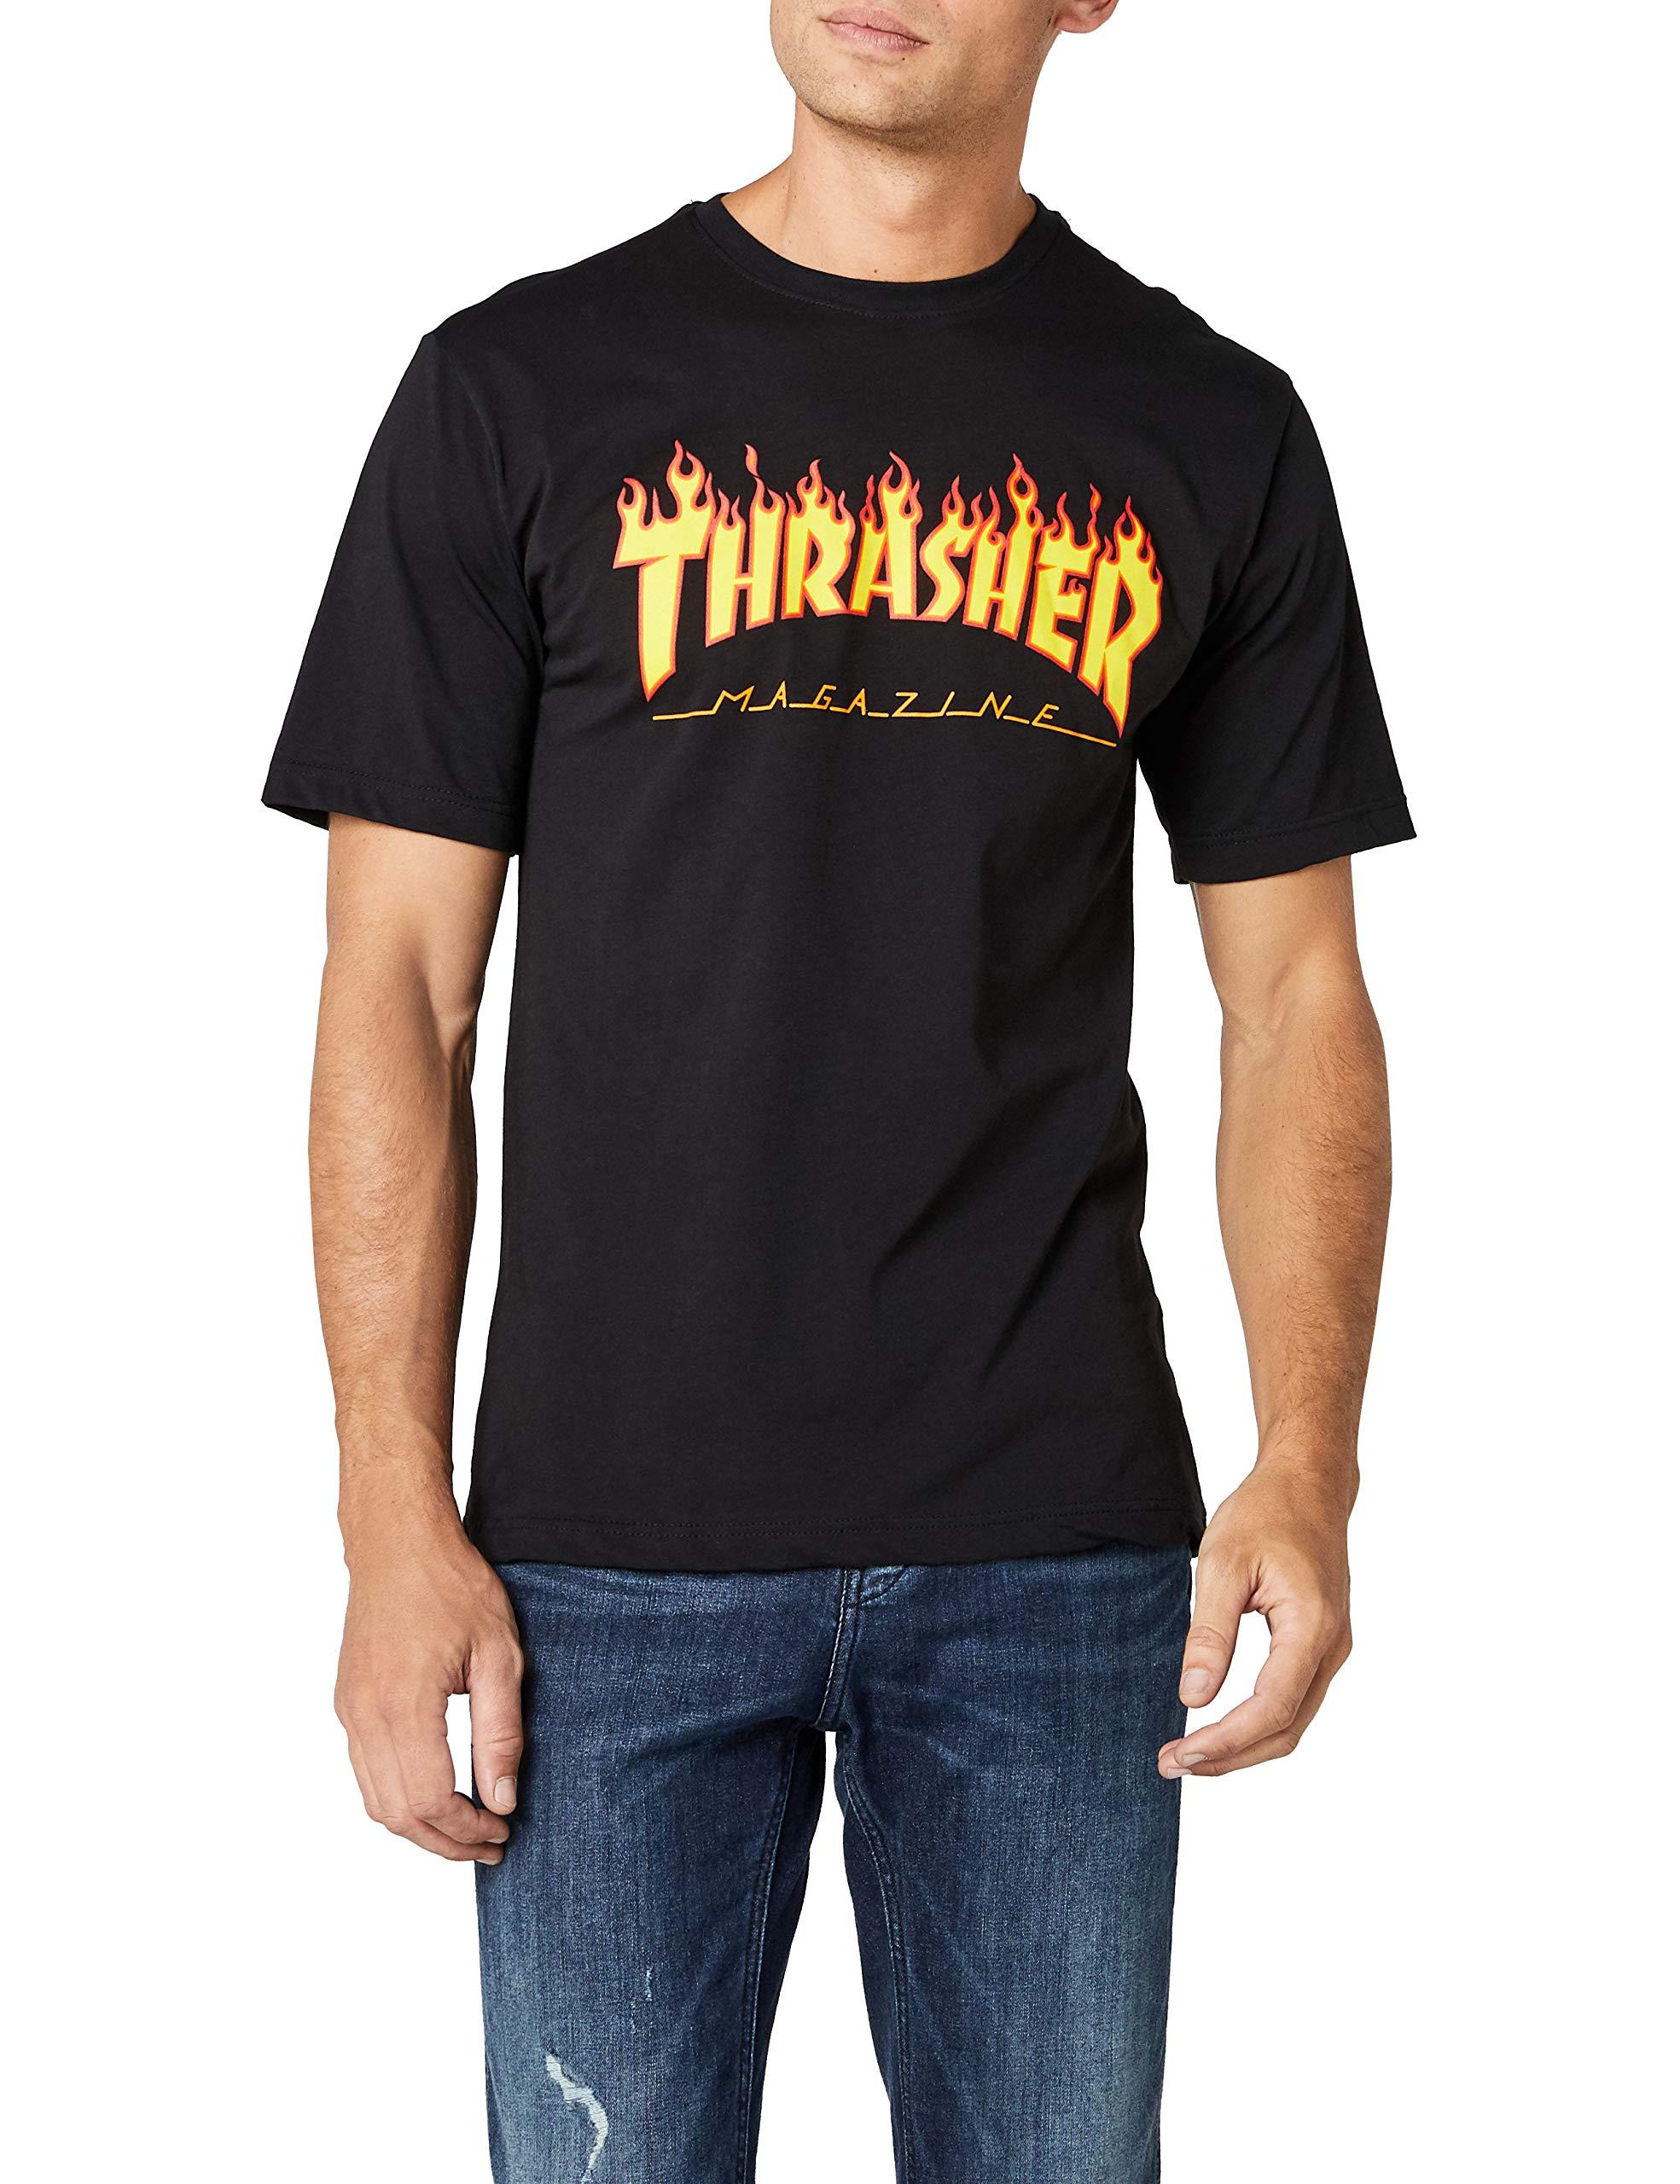 Thrasher Magazine Flame Logo T-Shirt - Medium- Black by Thrasher (Image #1)